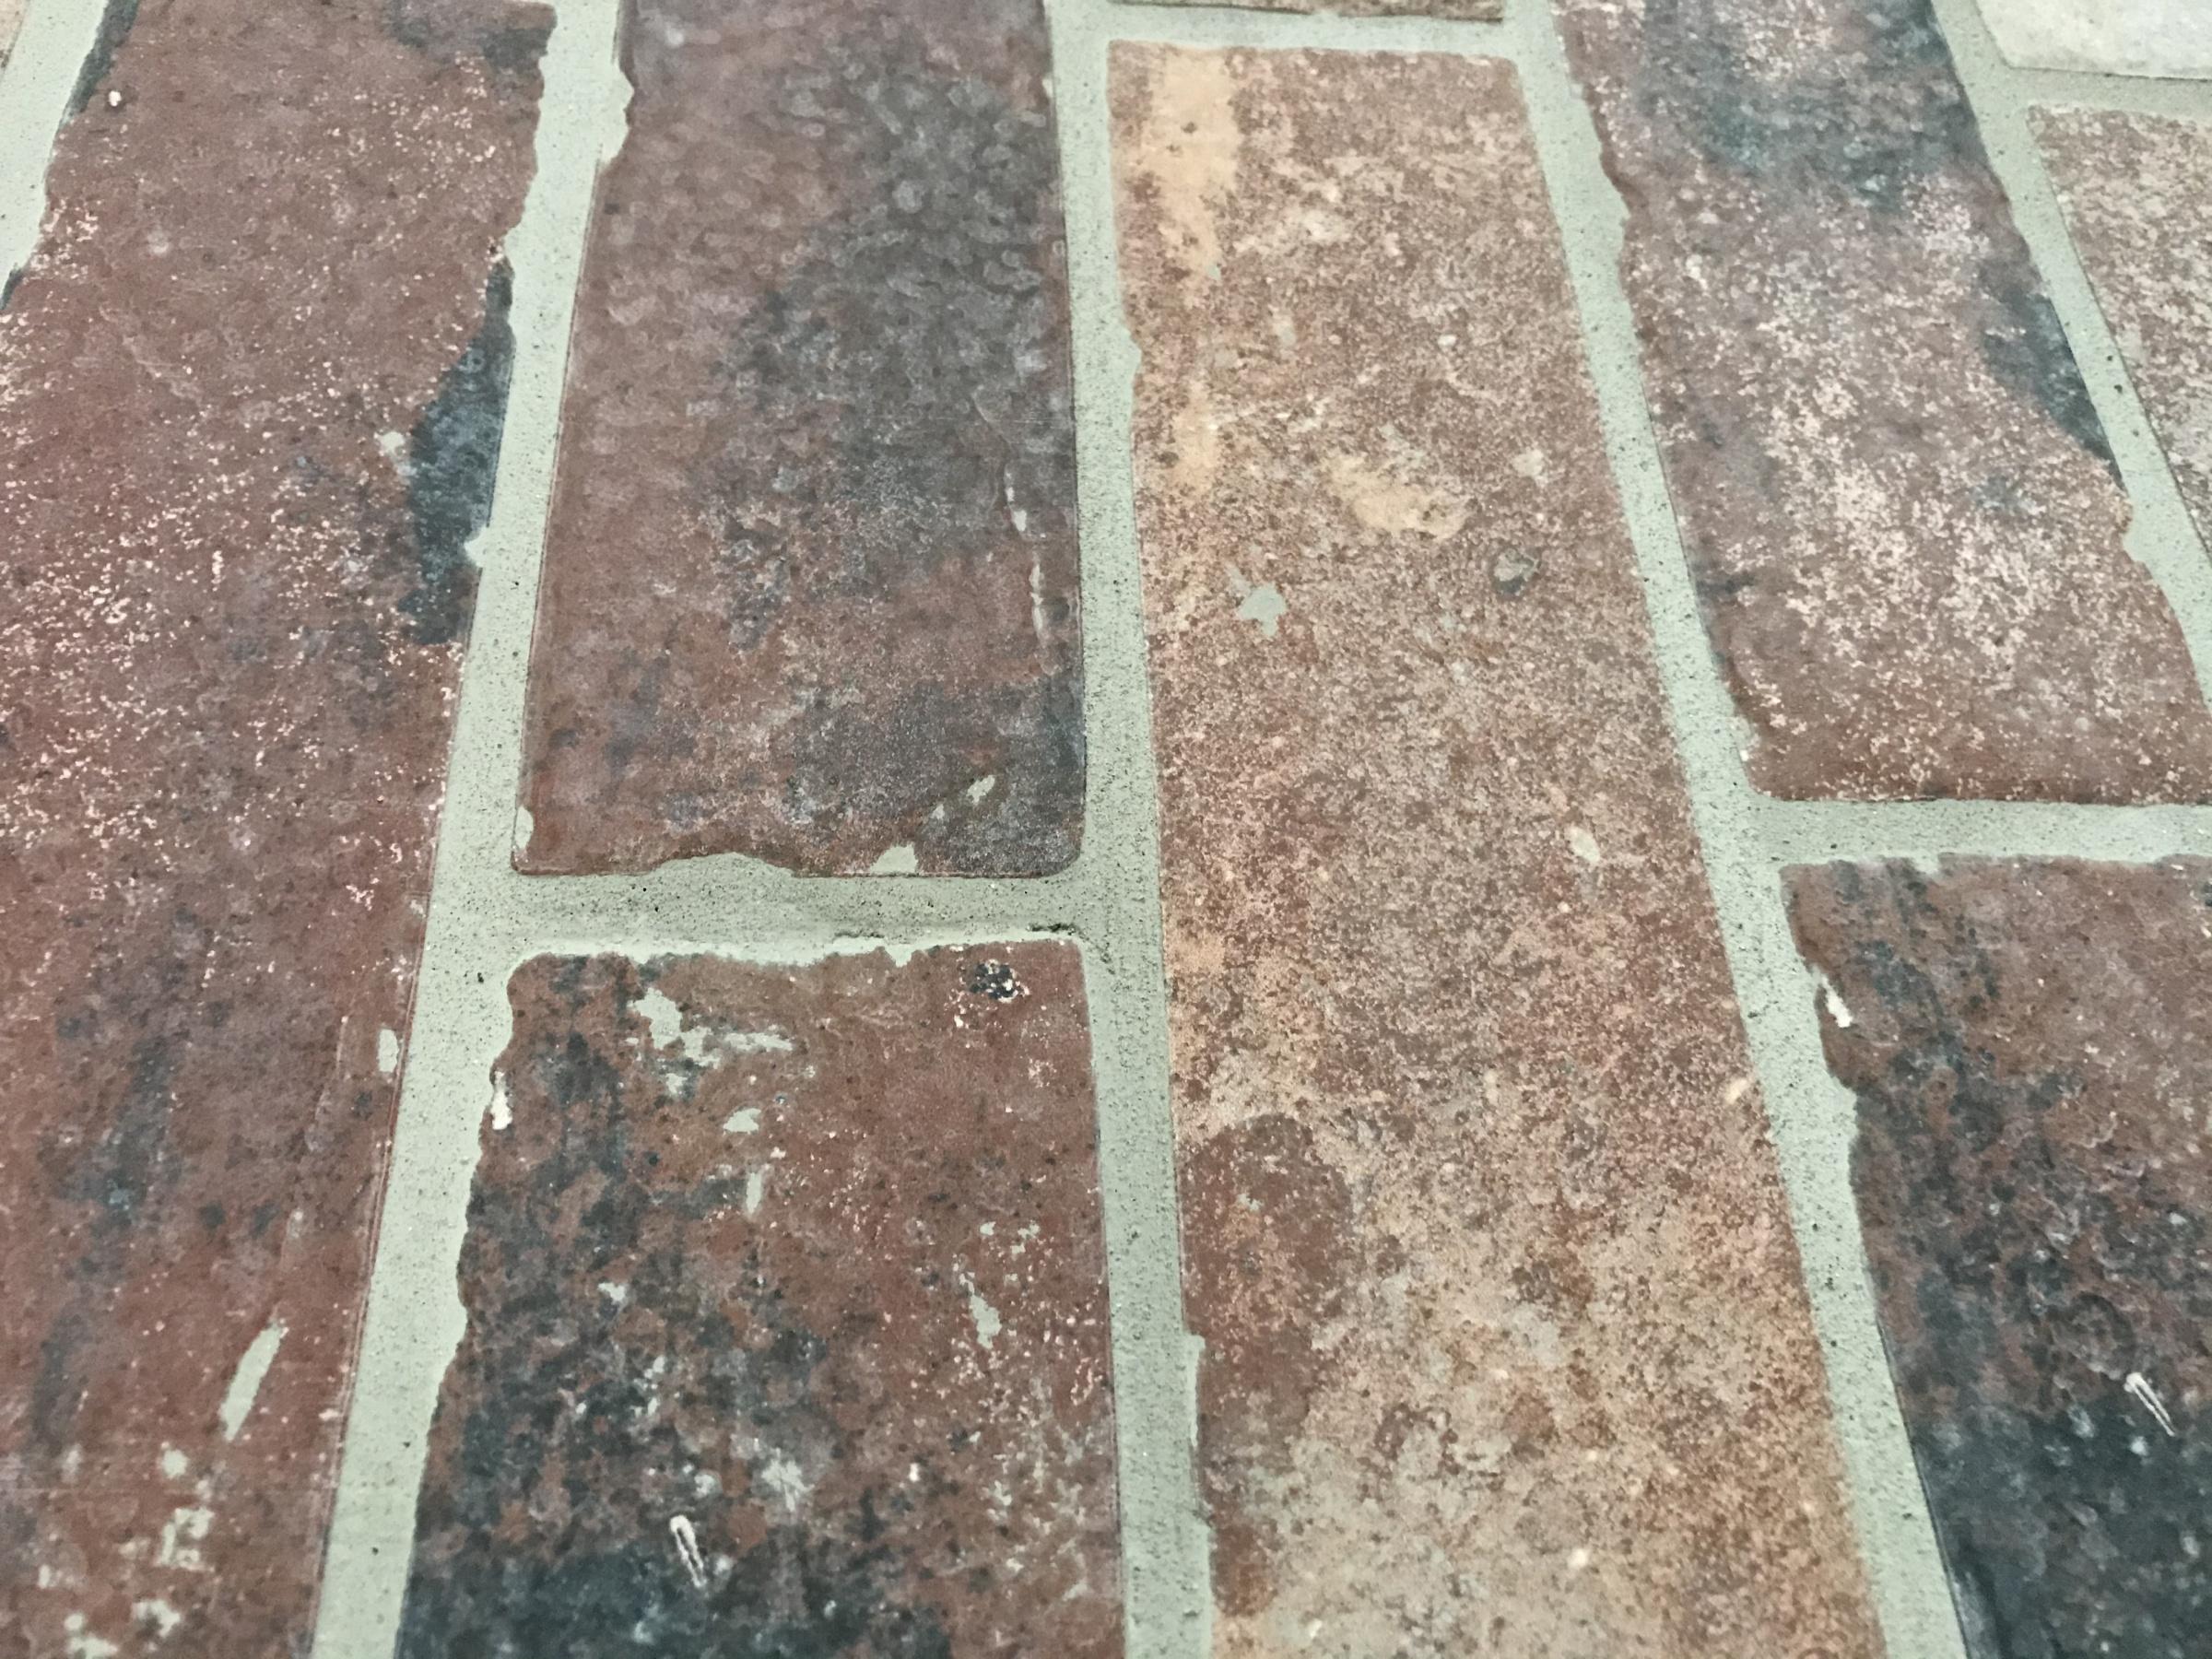 Brick tile on wall-ec5f32b3-1db8-4b2e-a76e-6a7202ab7737.jpg